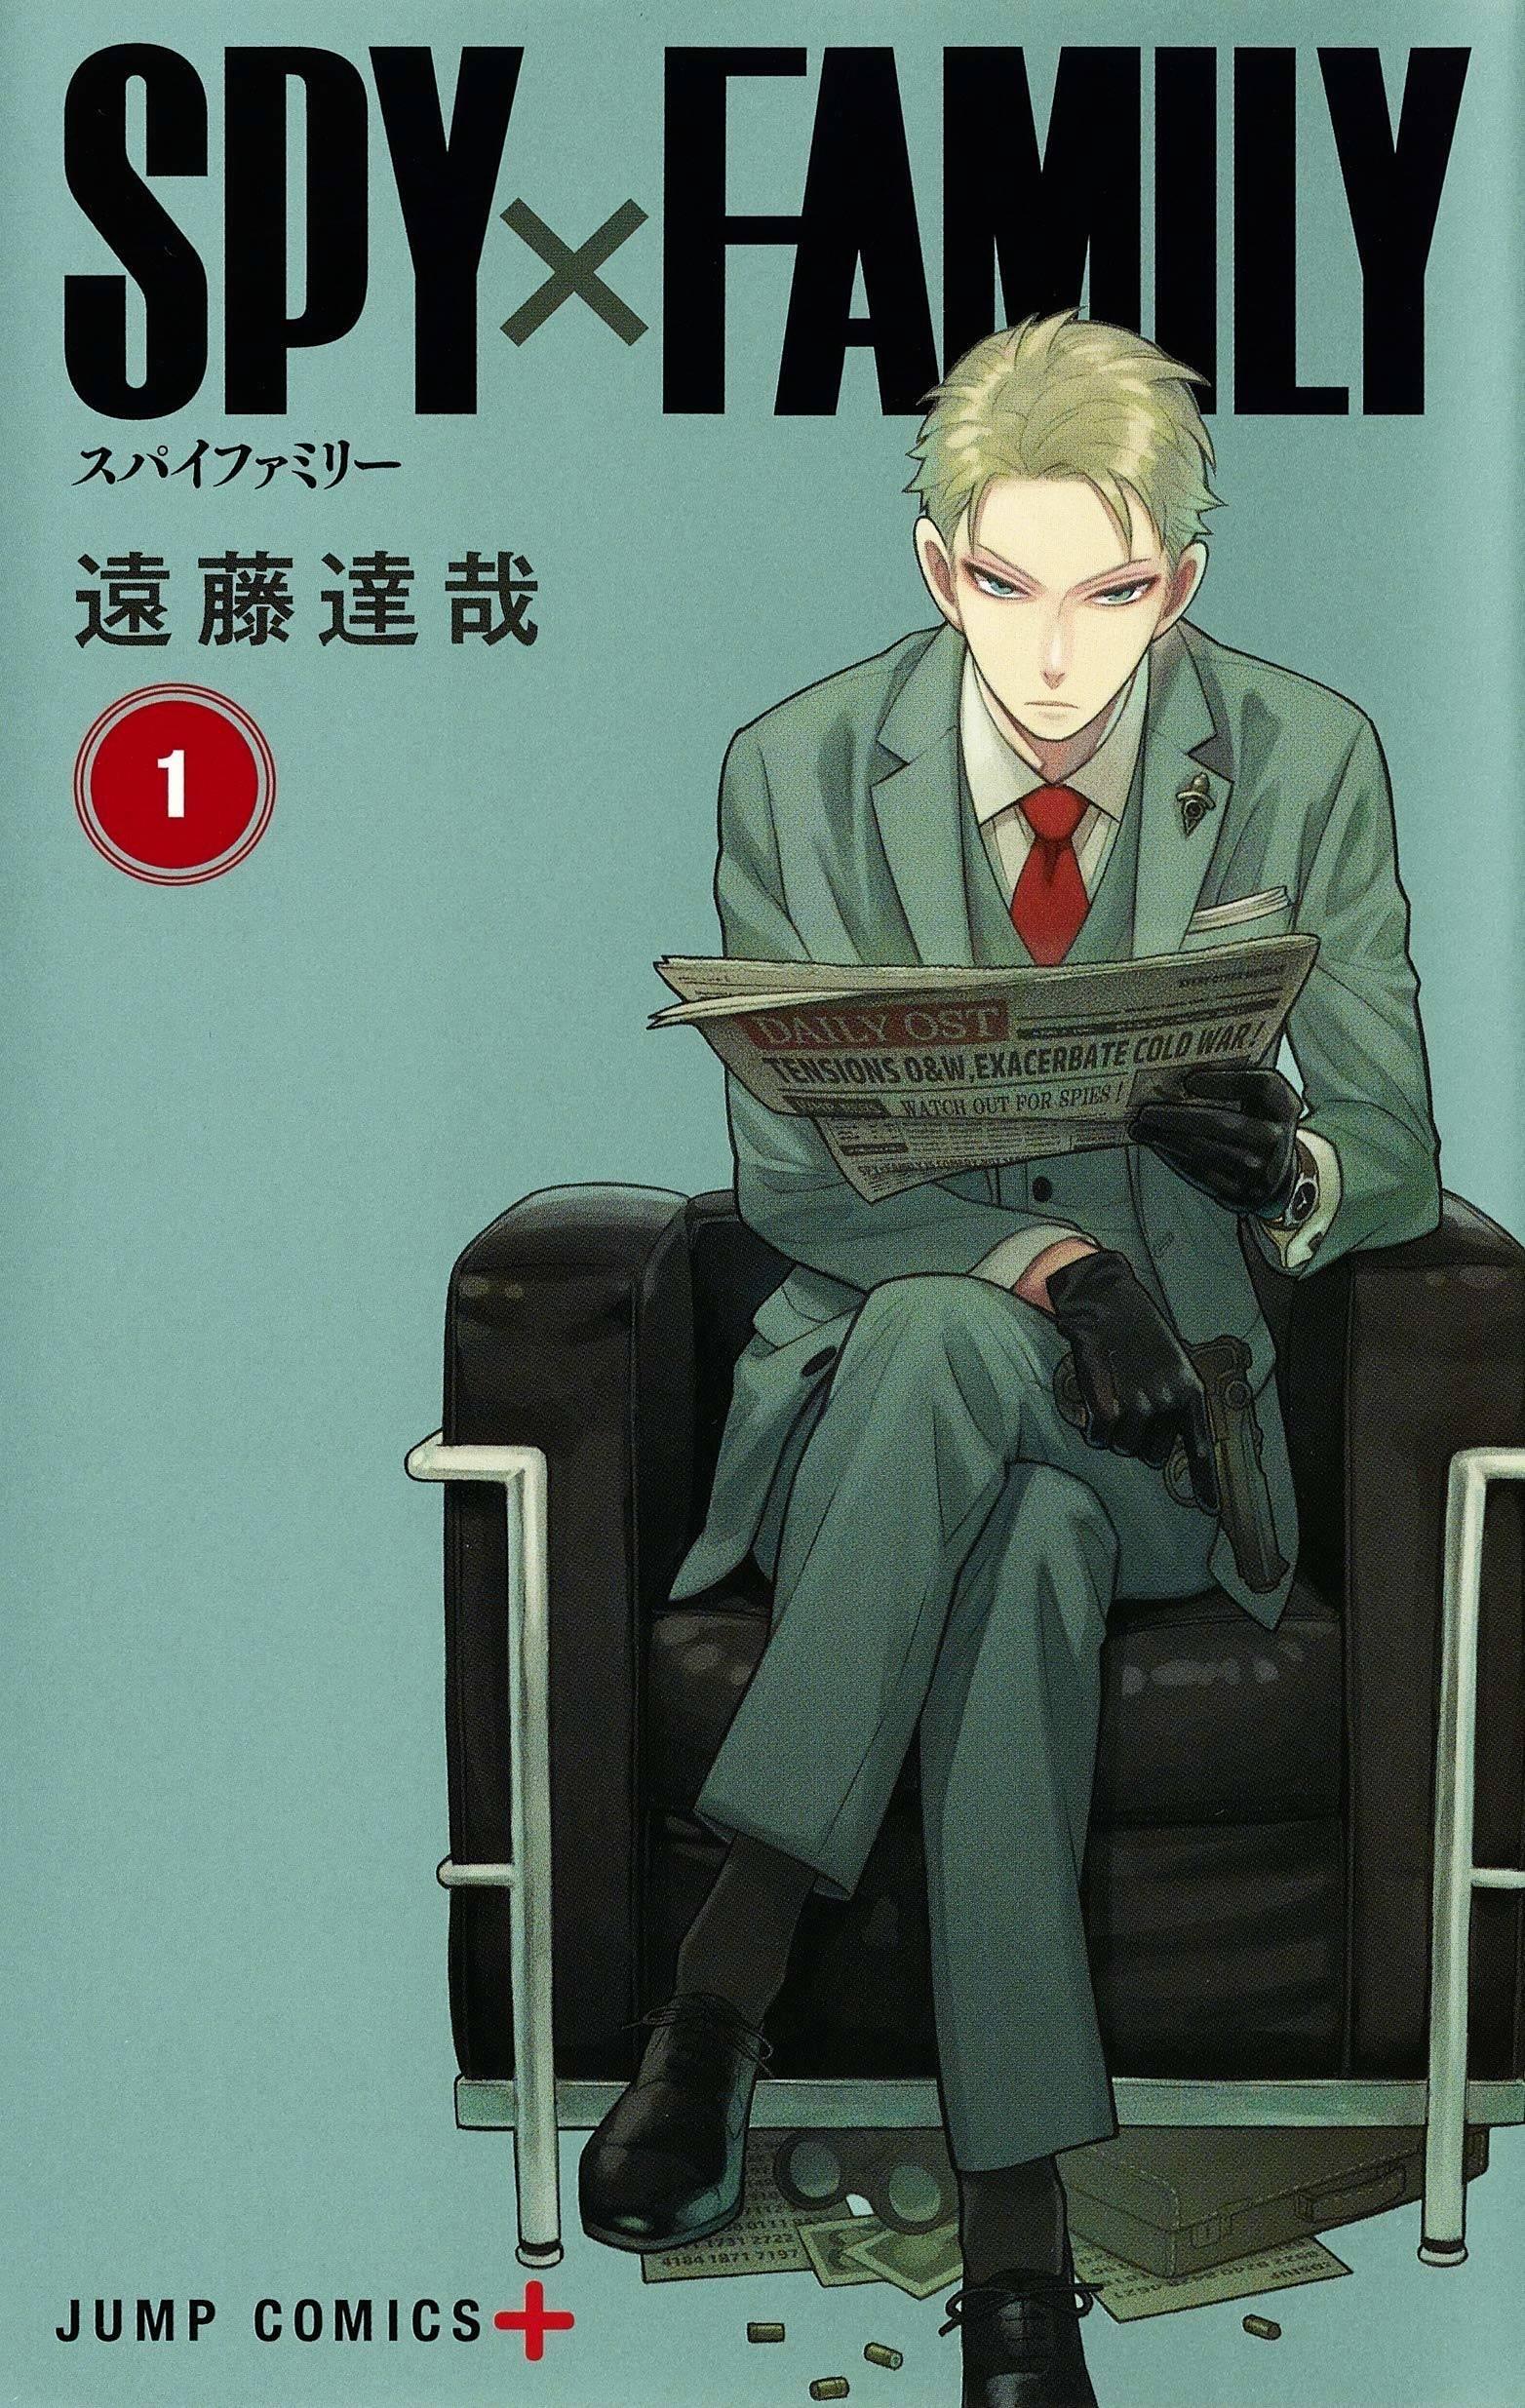 Cover Volume 1